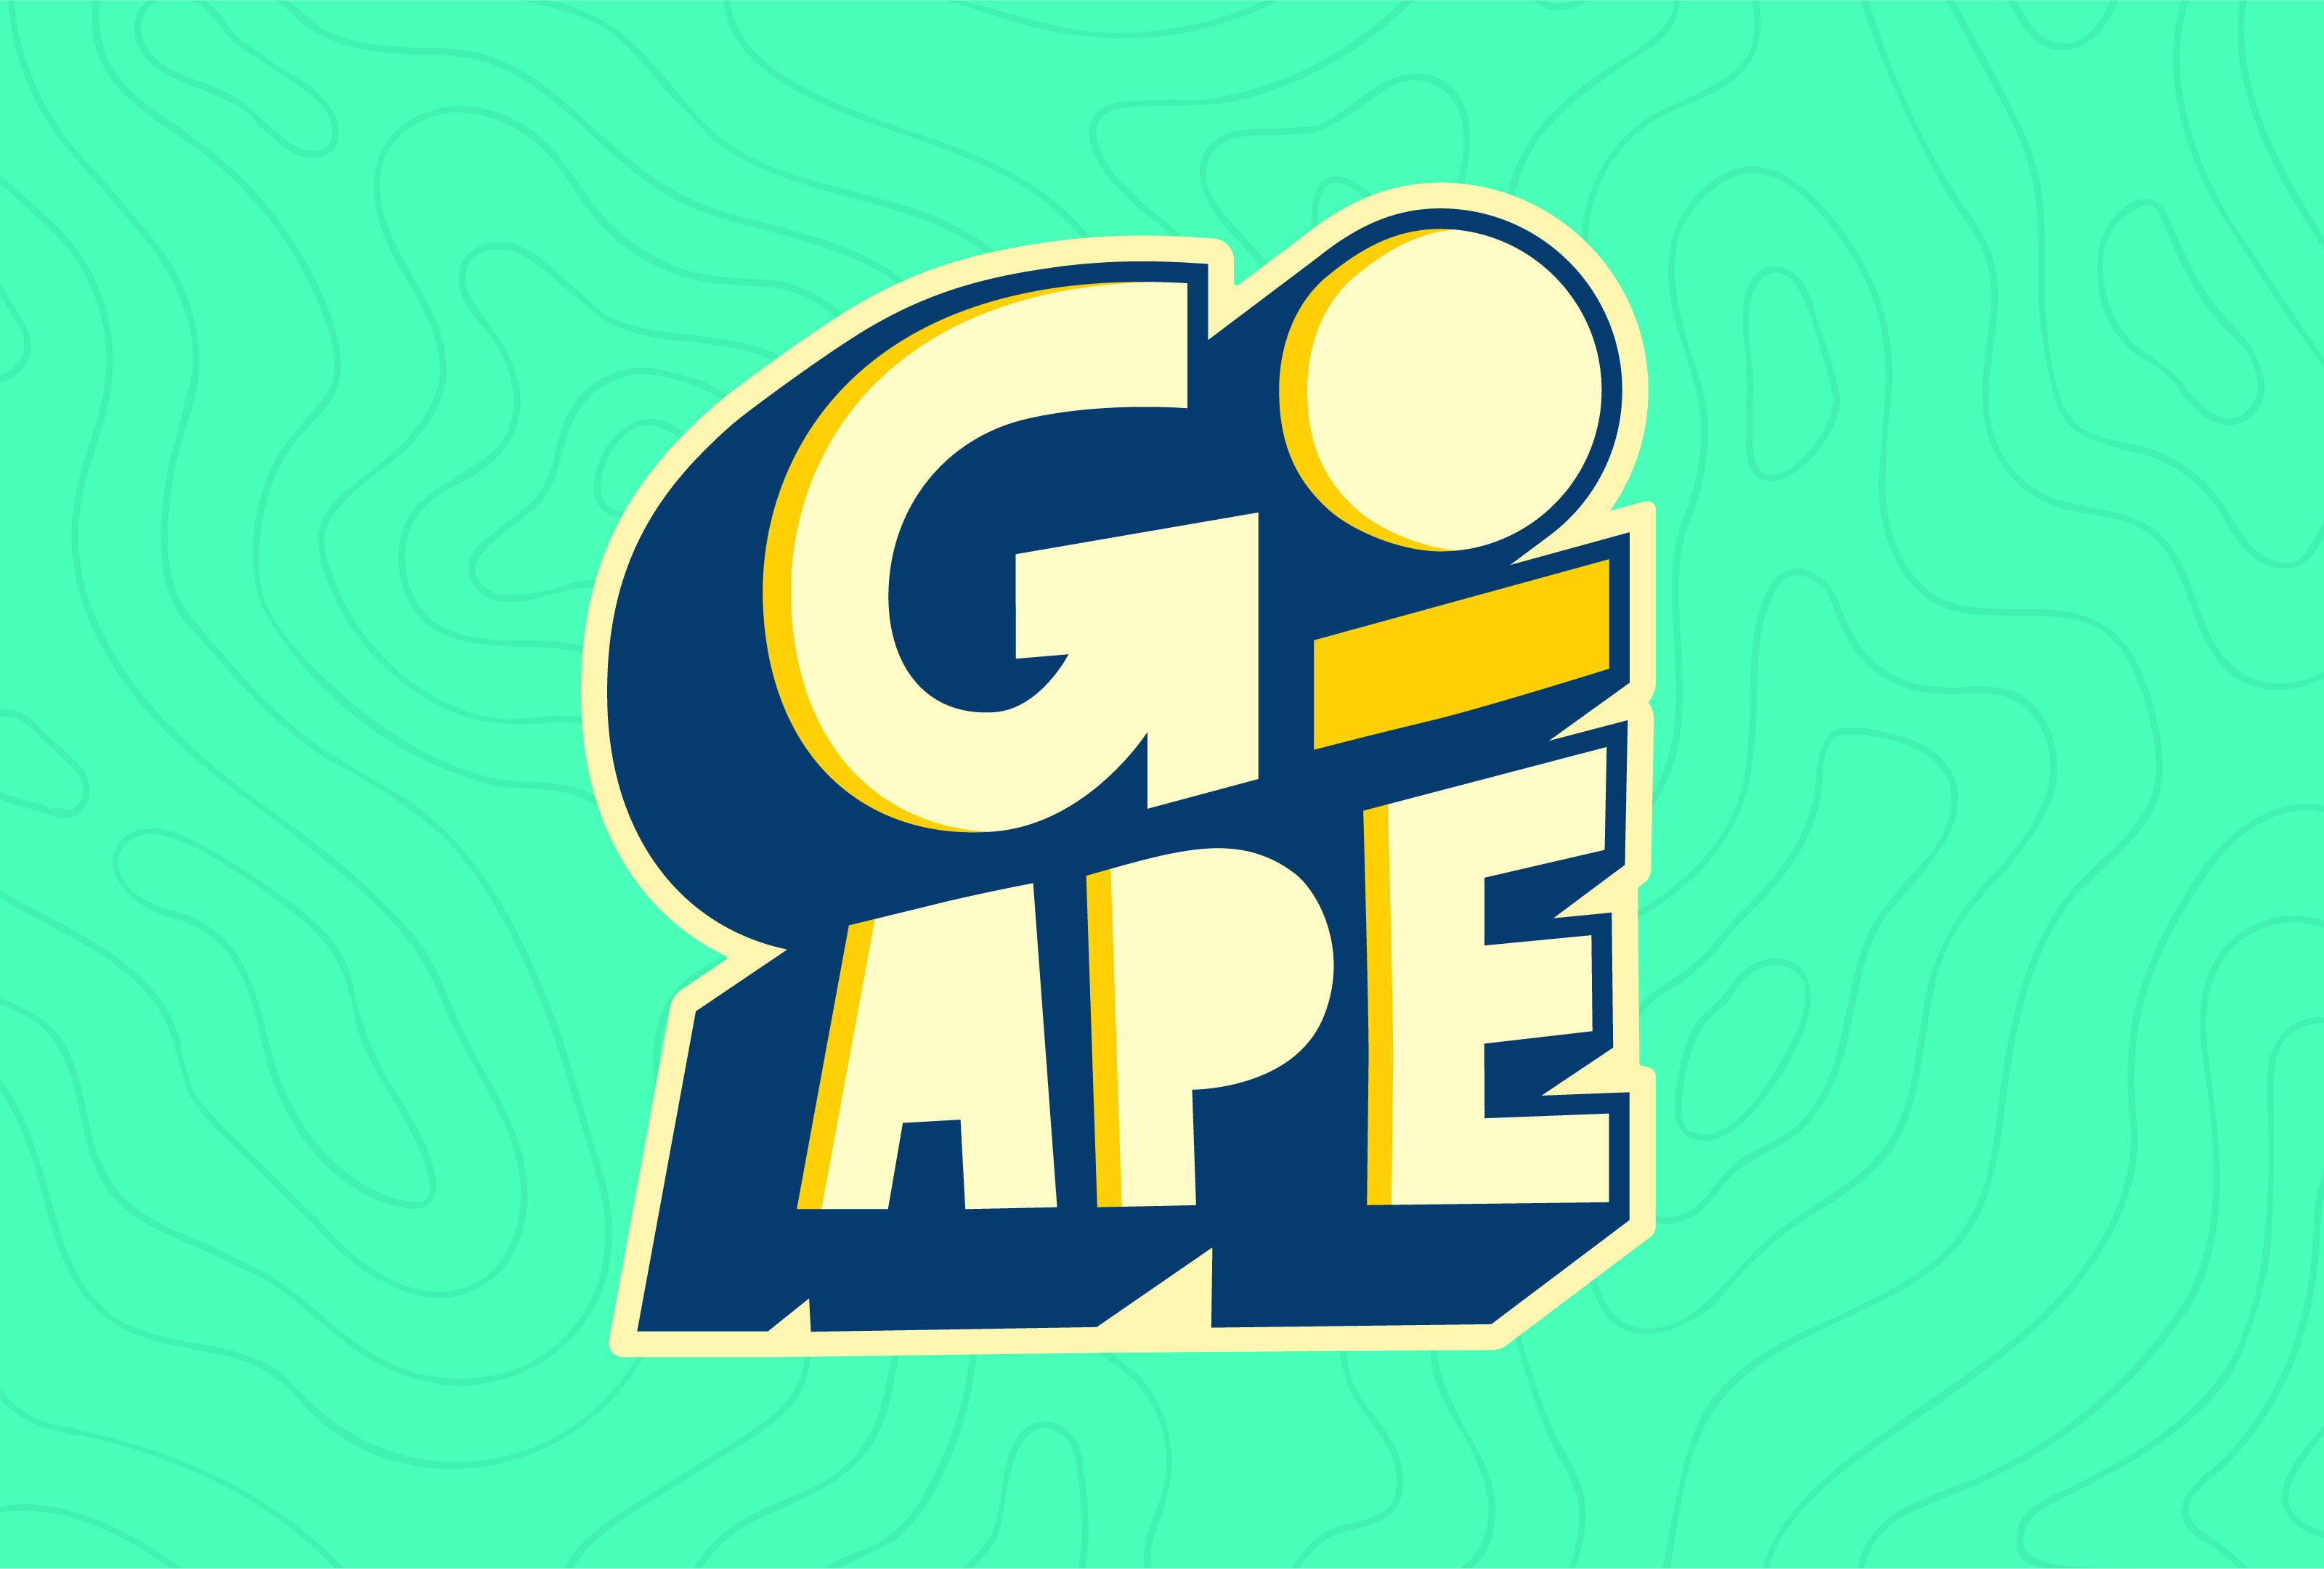 Go Ape Brand Identity